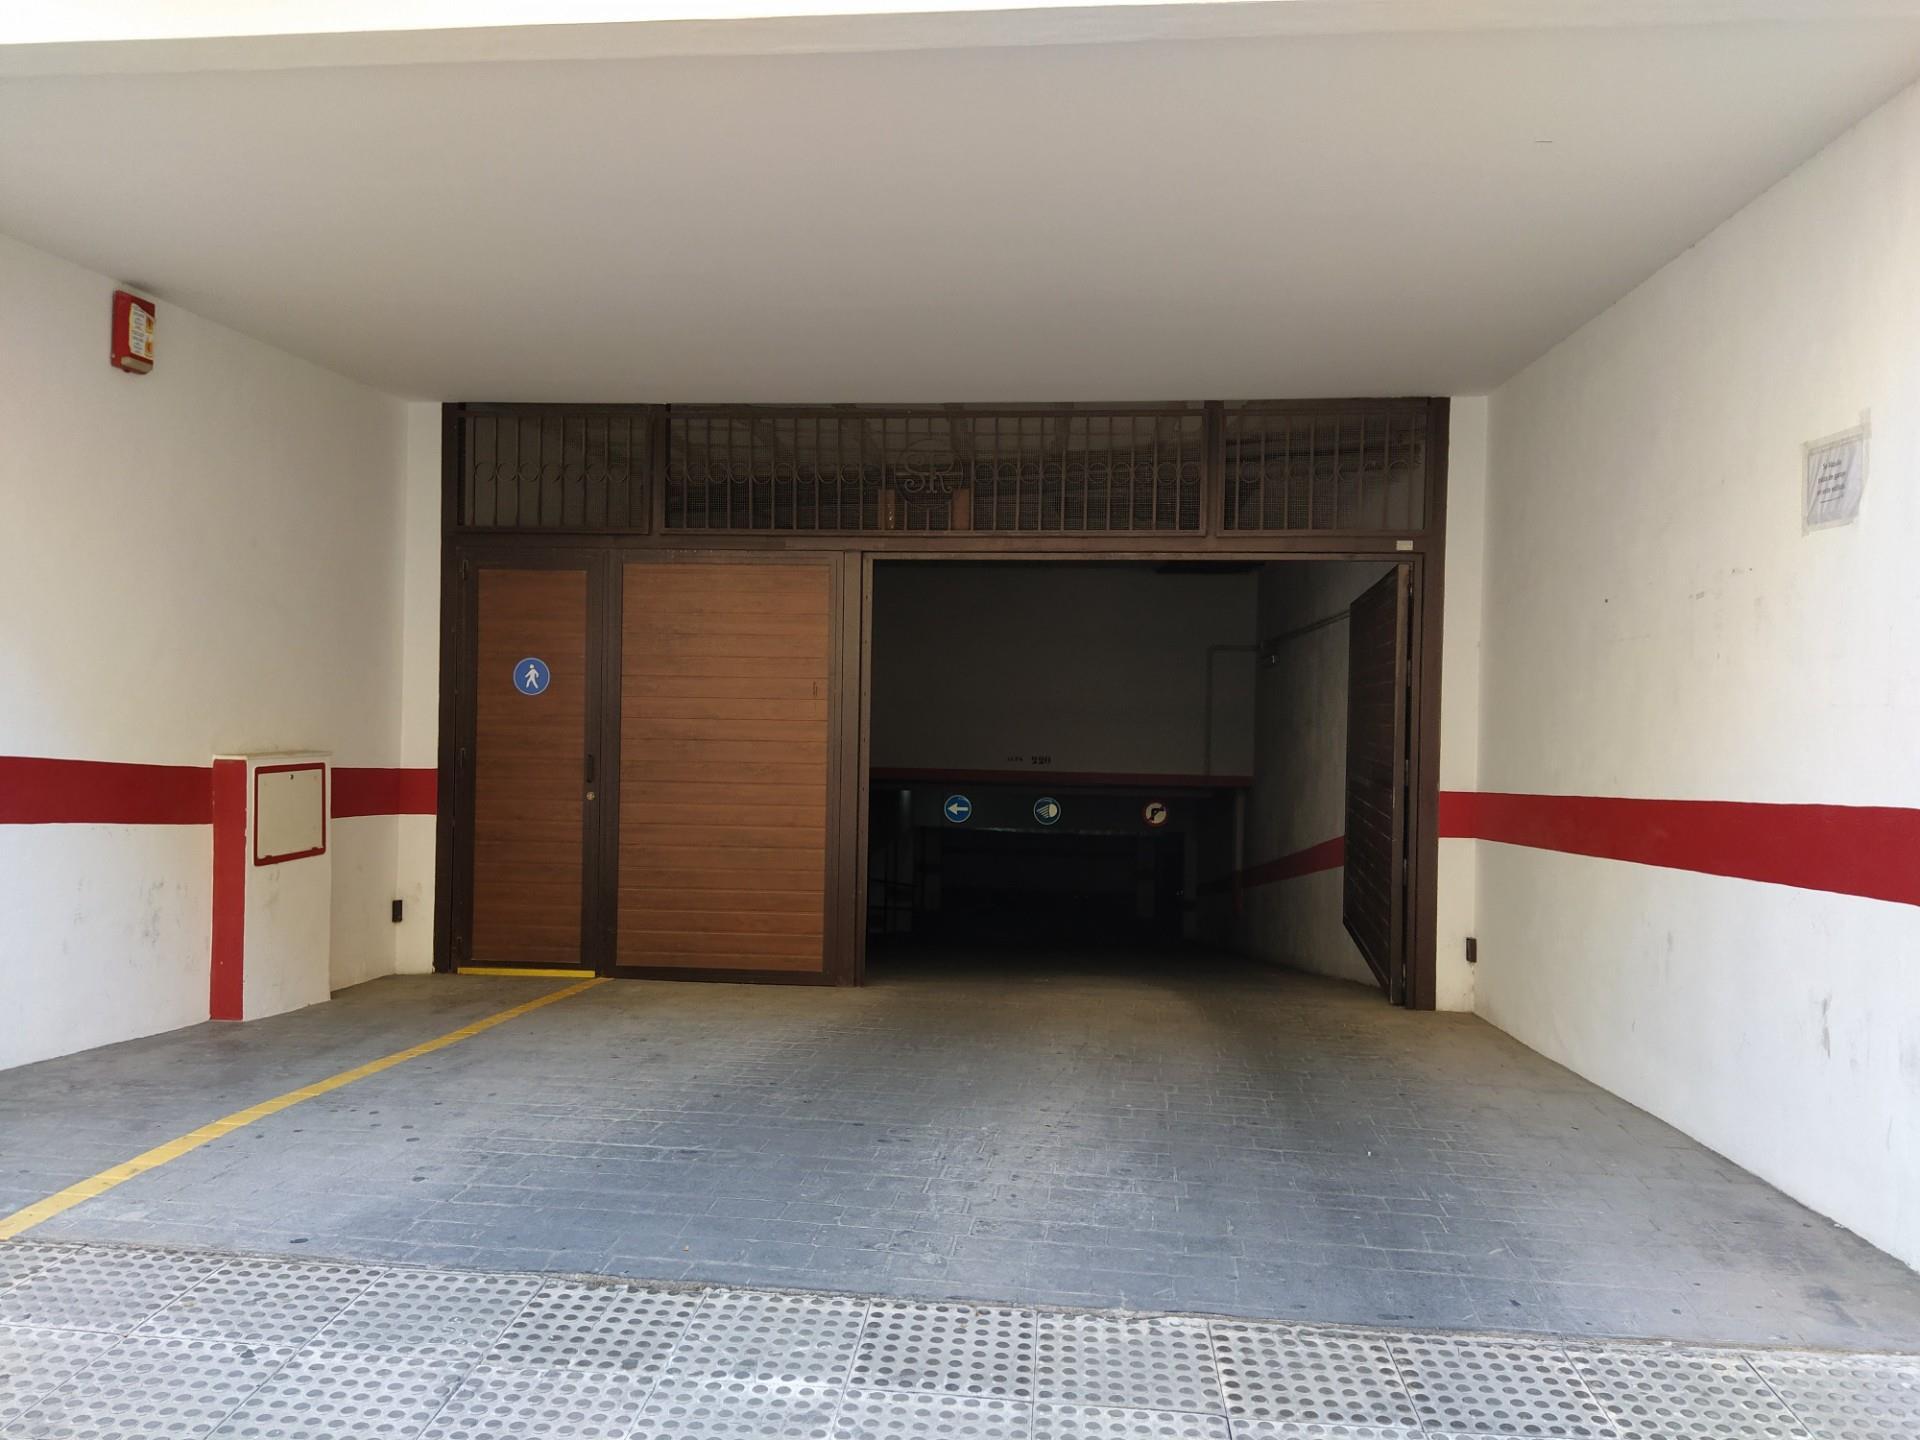 Garaje de alquiler en Calle Pintor Jesús González de la Torre Ronda (Ronda, Málaga)